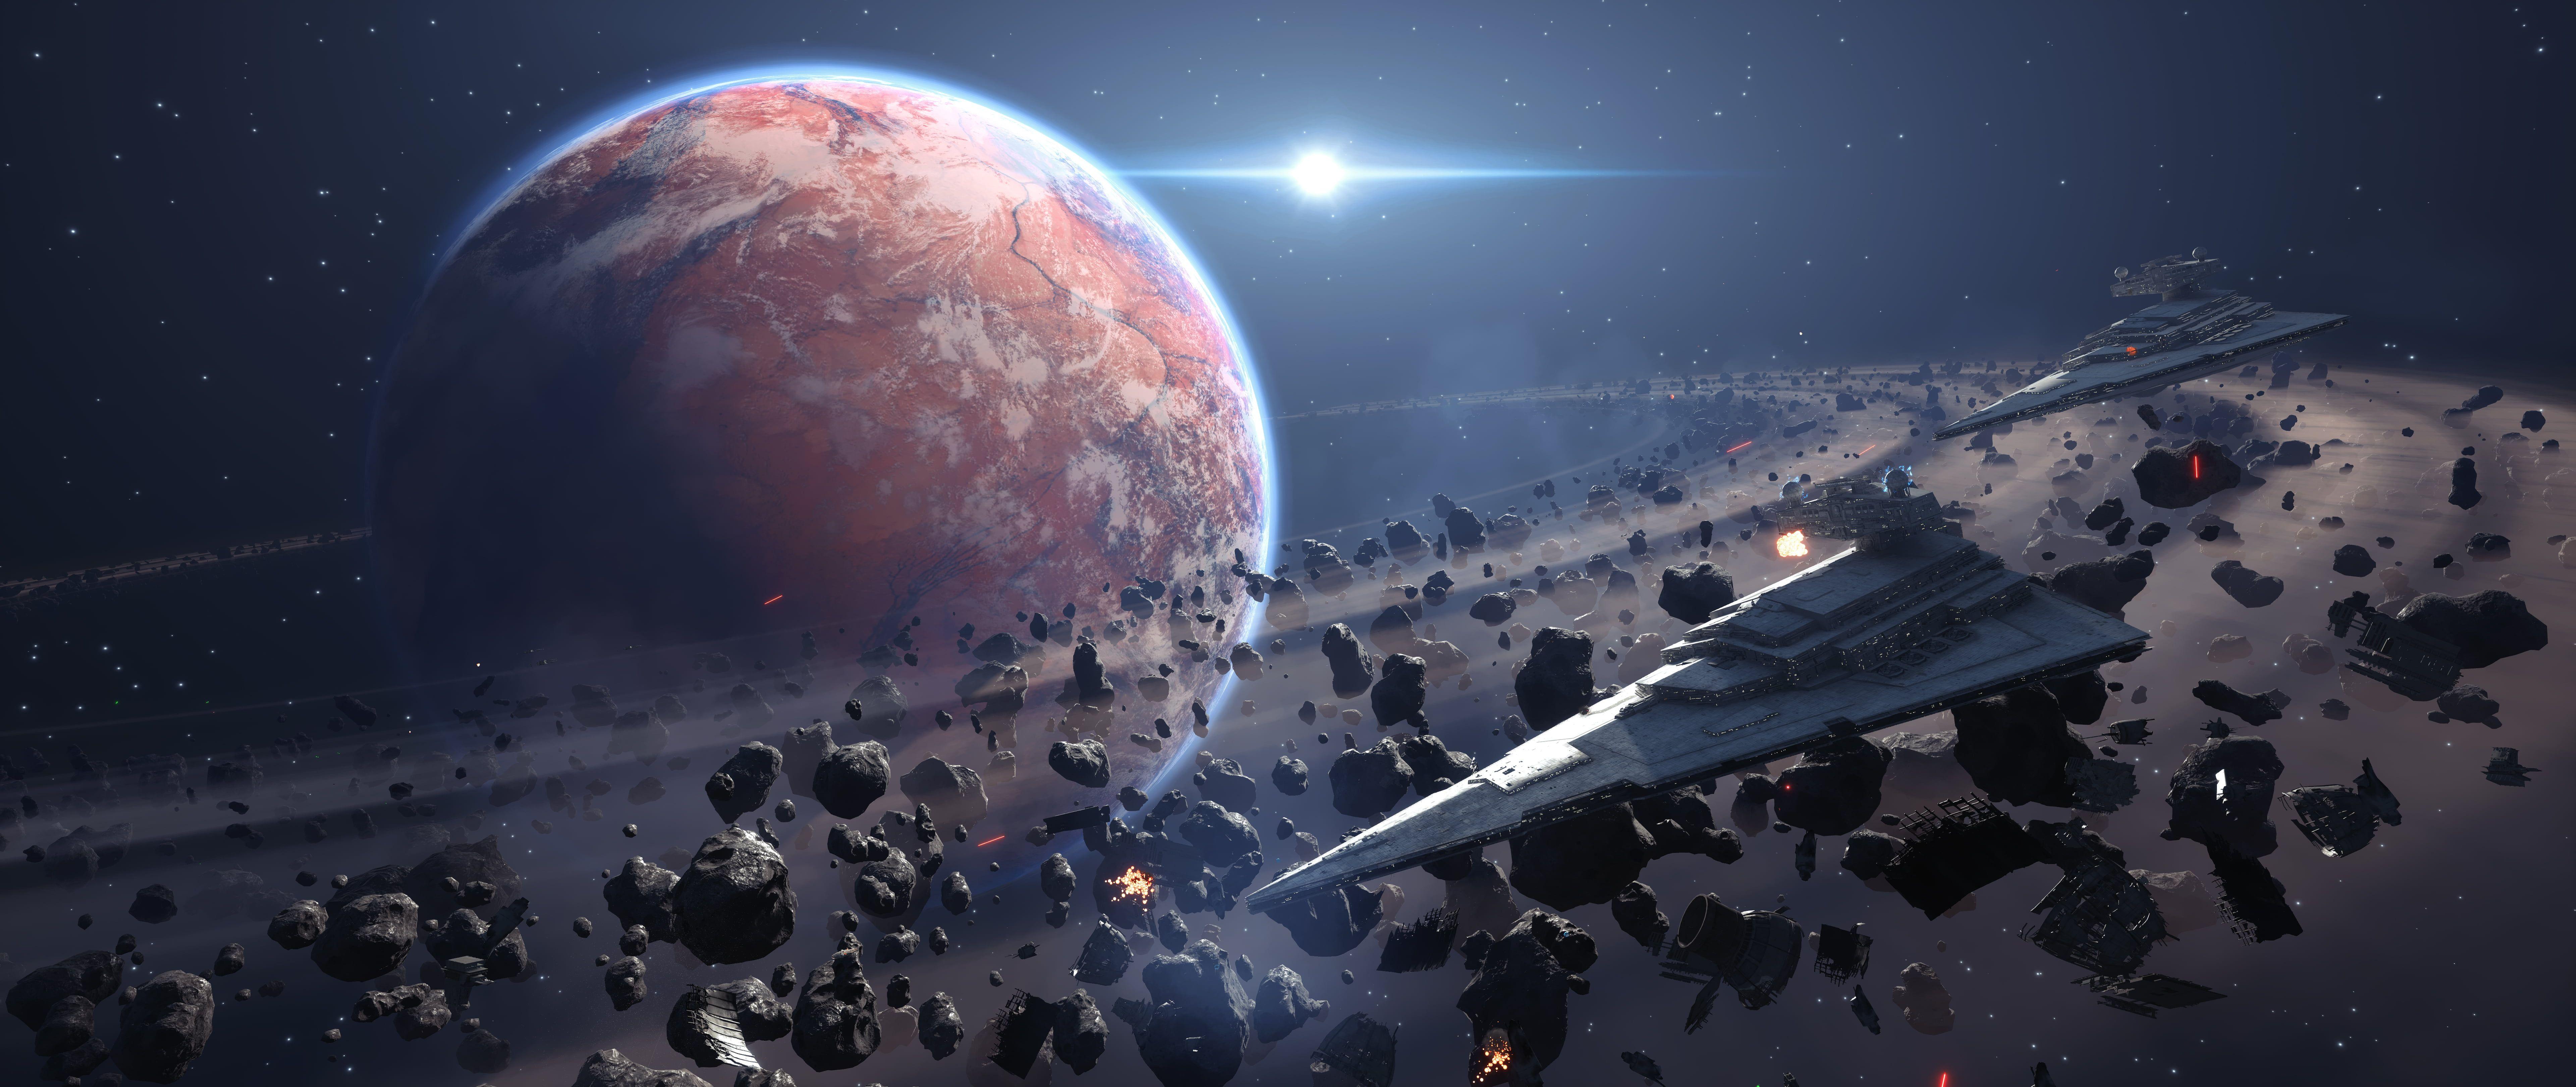 Saturn Planet Illustration Star Wars Battlefront Star Wars Star Destroyer Video Games 8k Wall In 2020 Star Destroyer Wallpaper Star Wars Awesome Star Wars Wallpaper